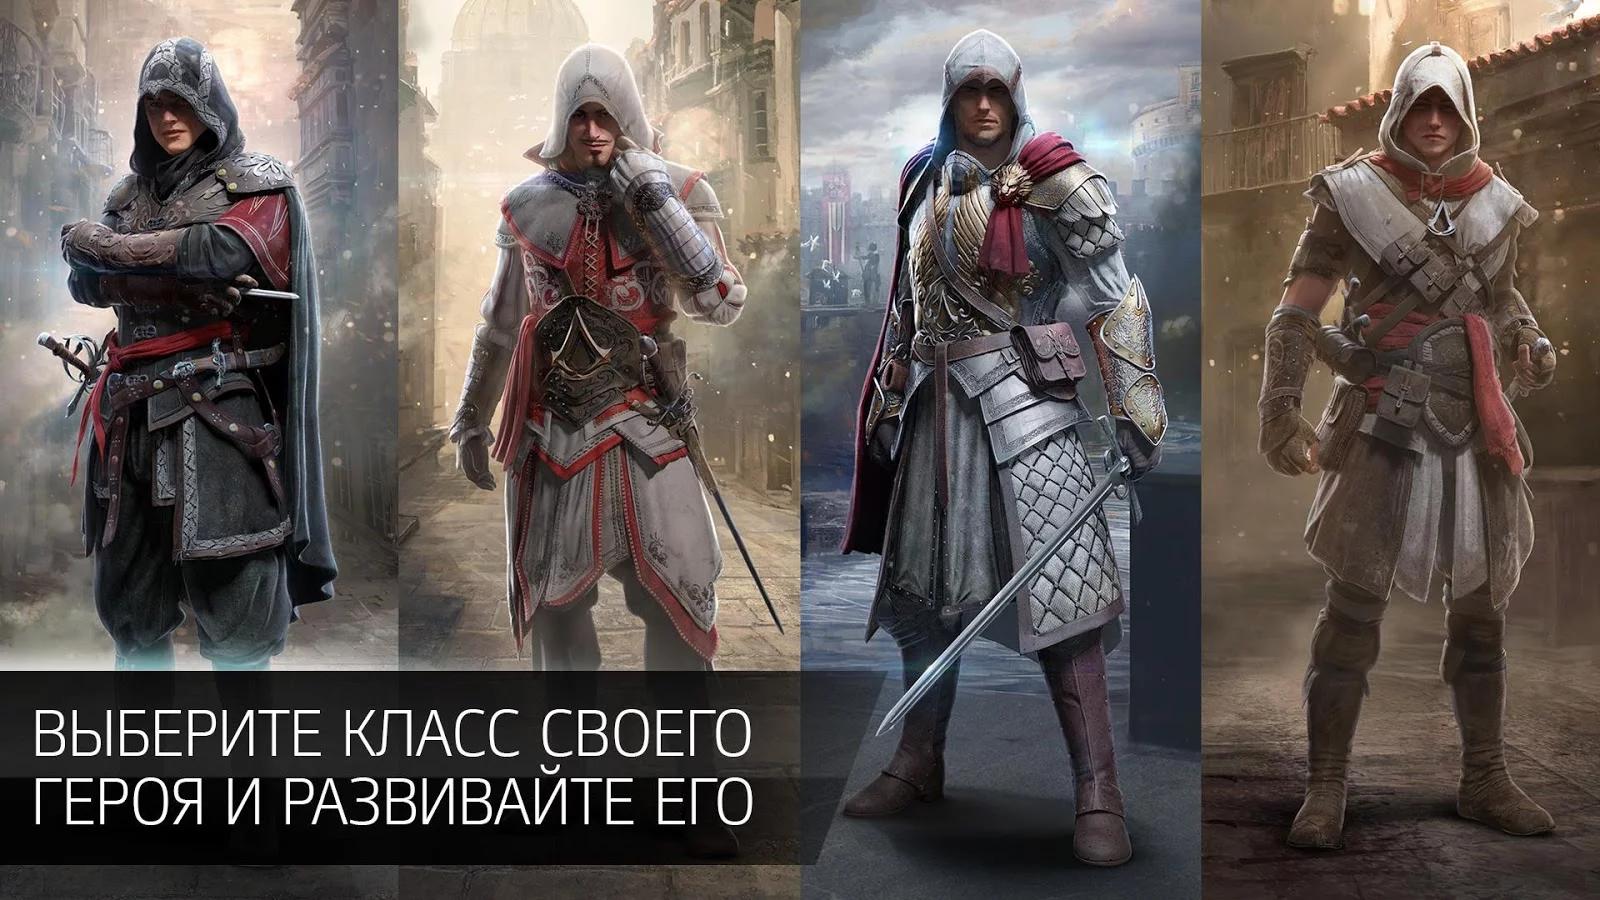 Assassins Creed Для Android - kamelotsudak